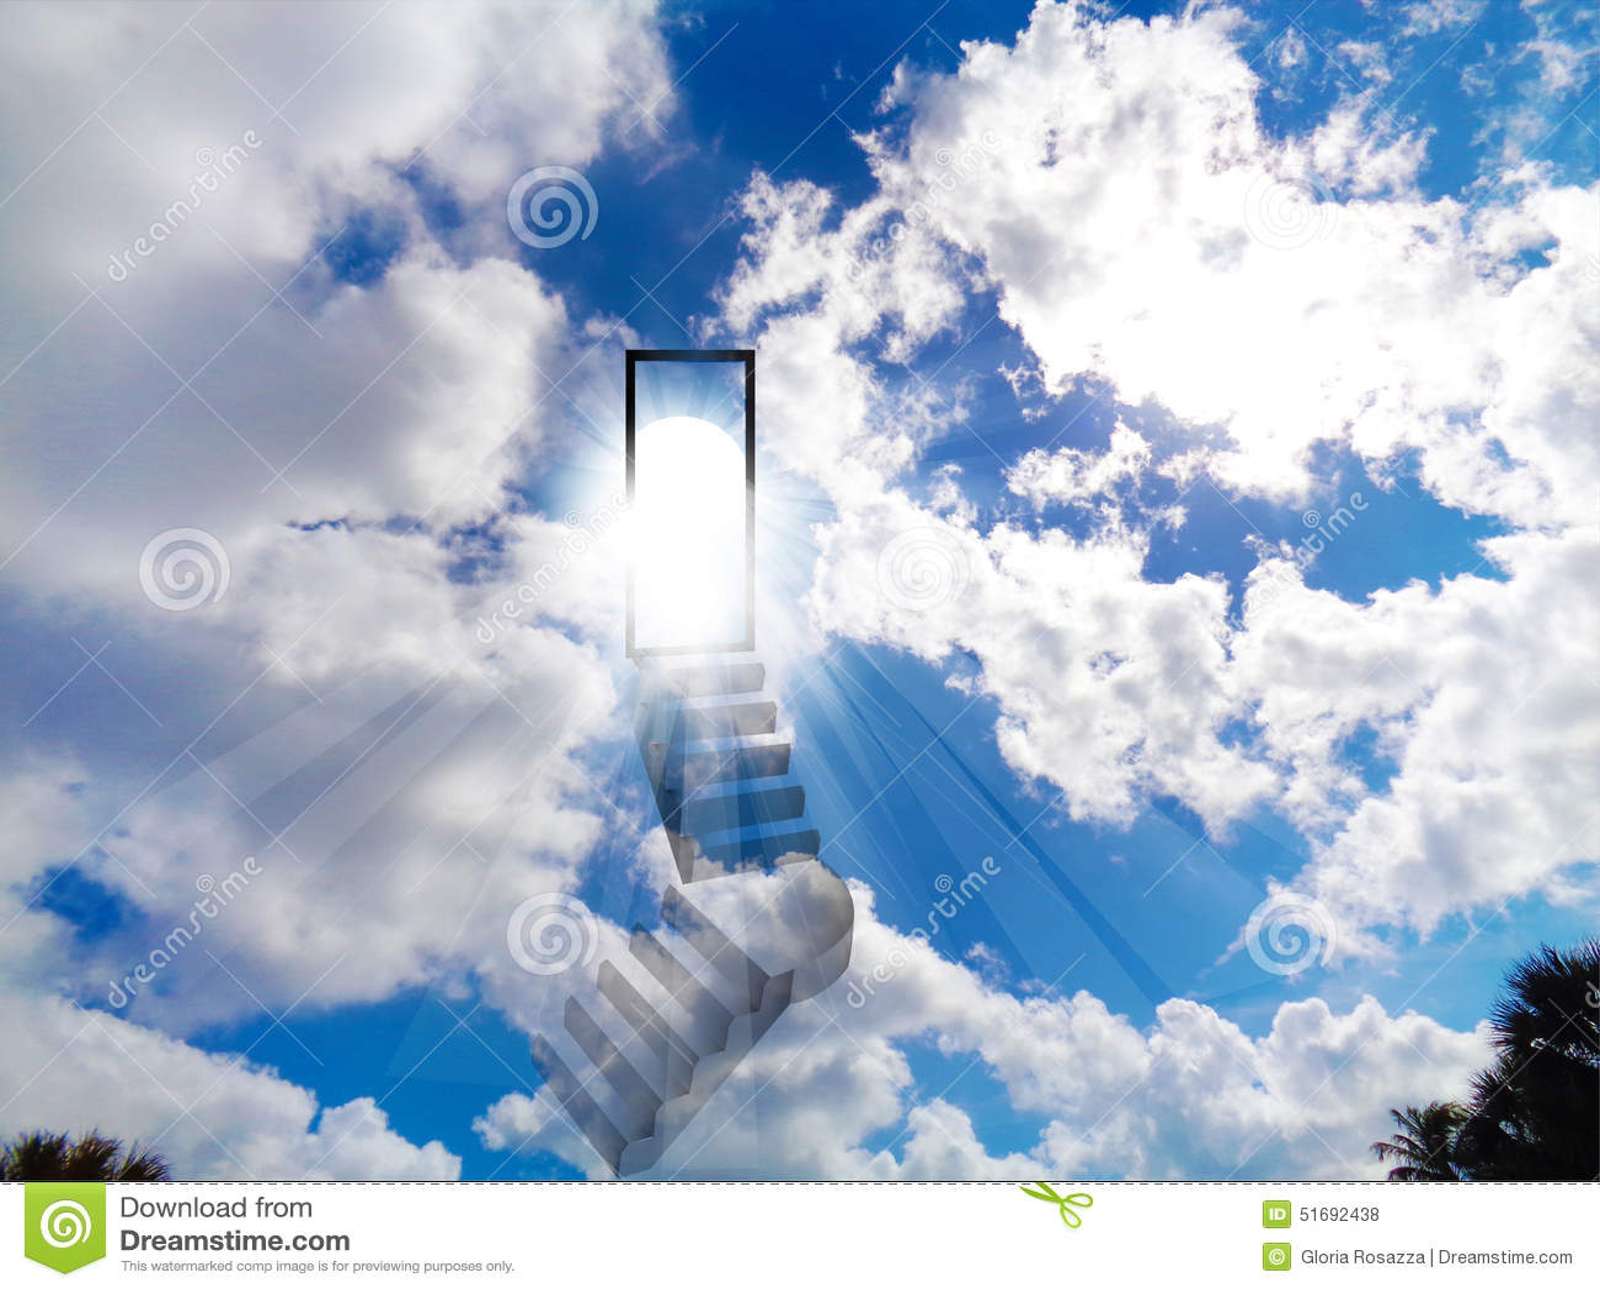 Jesus Christ 3d Wallpaper Download Stair To Heaven Blue Vivid Shiny Sky Stock Illustration